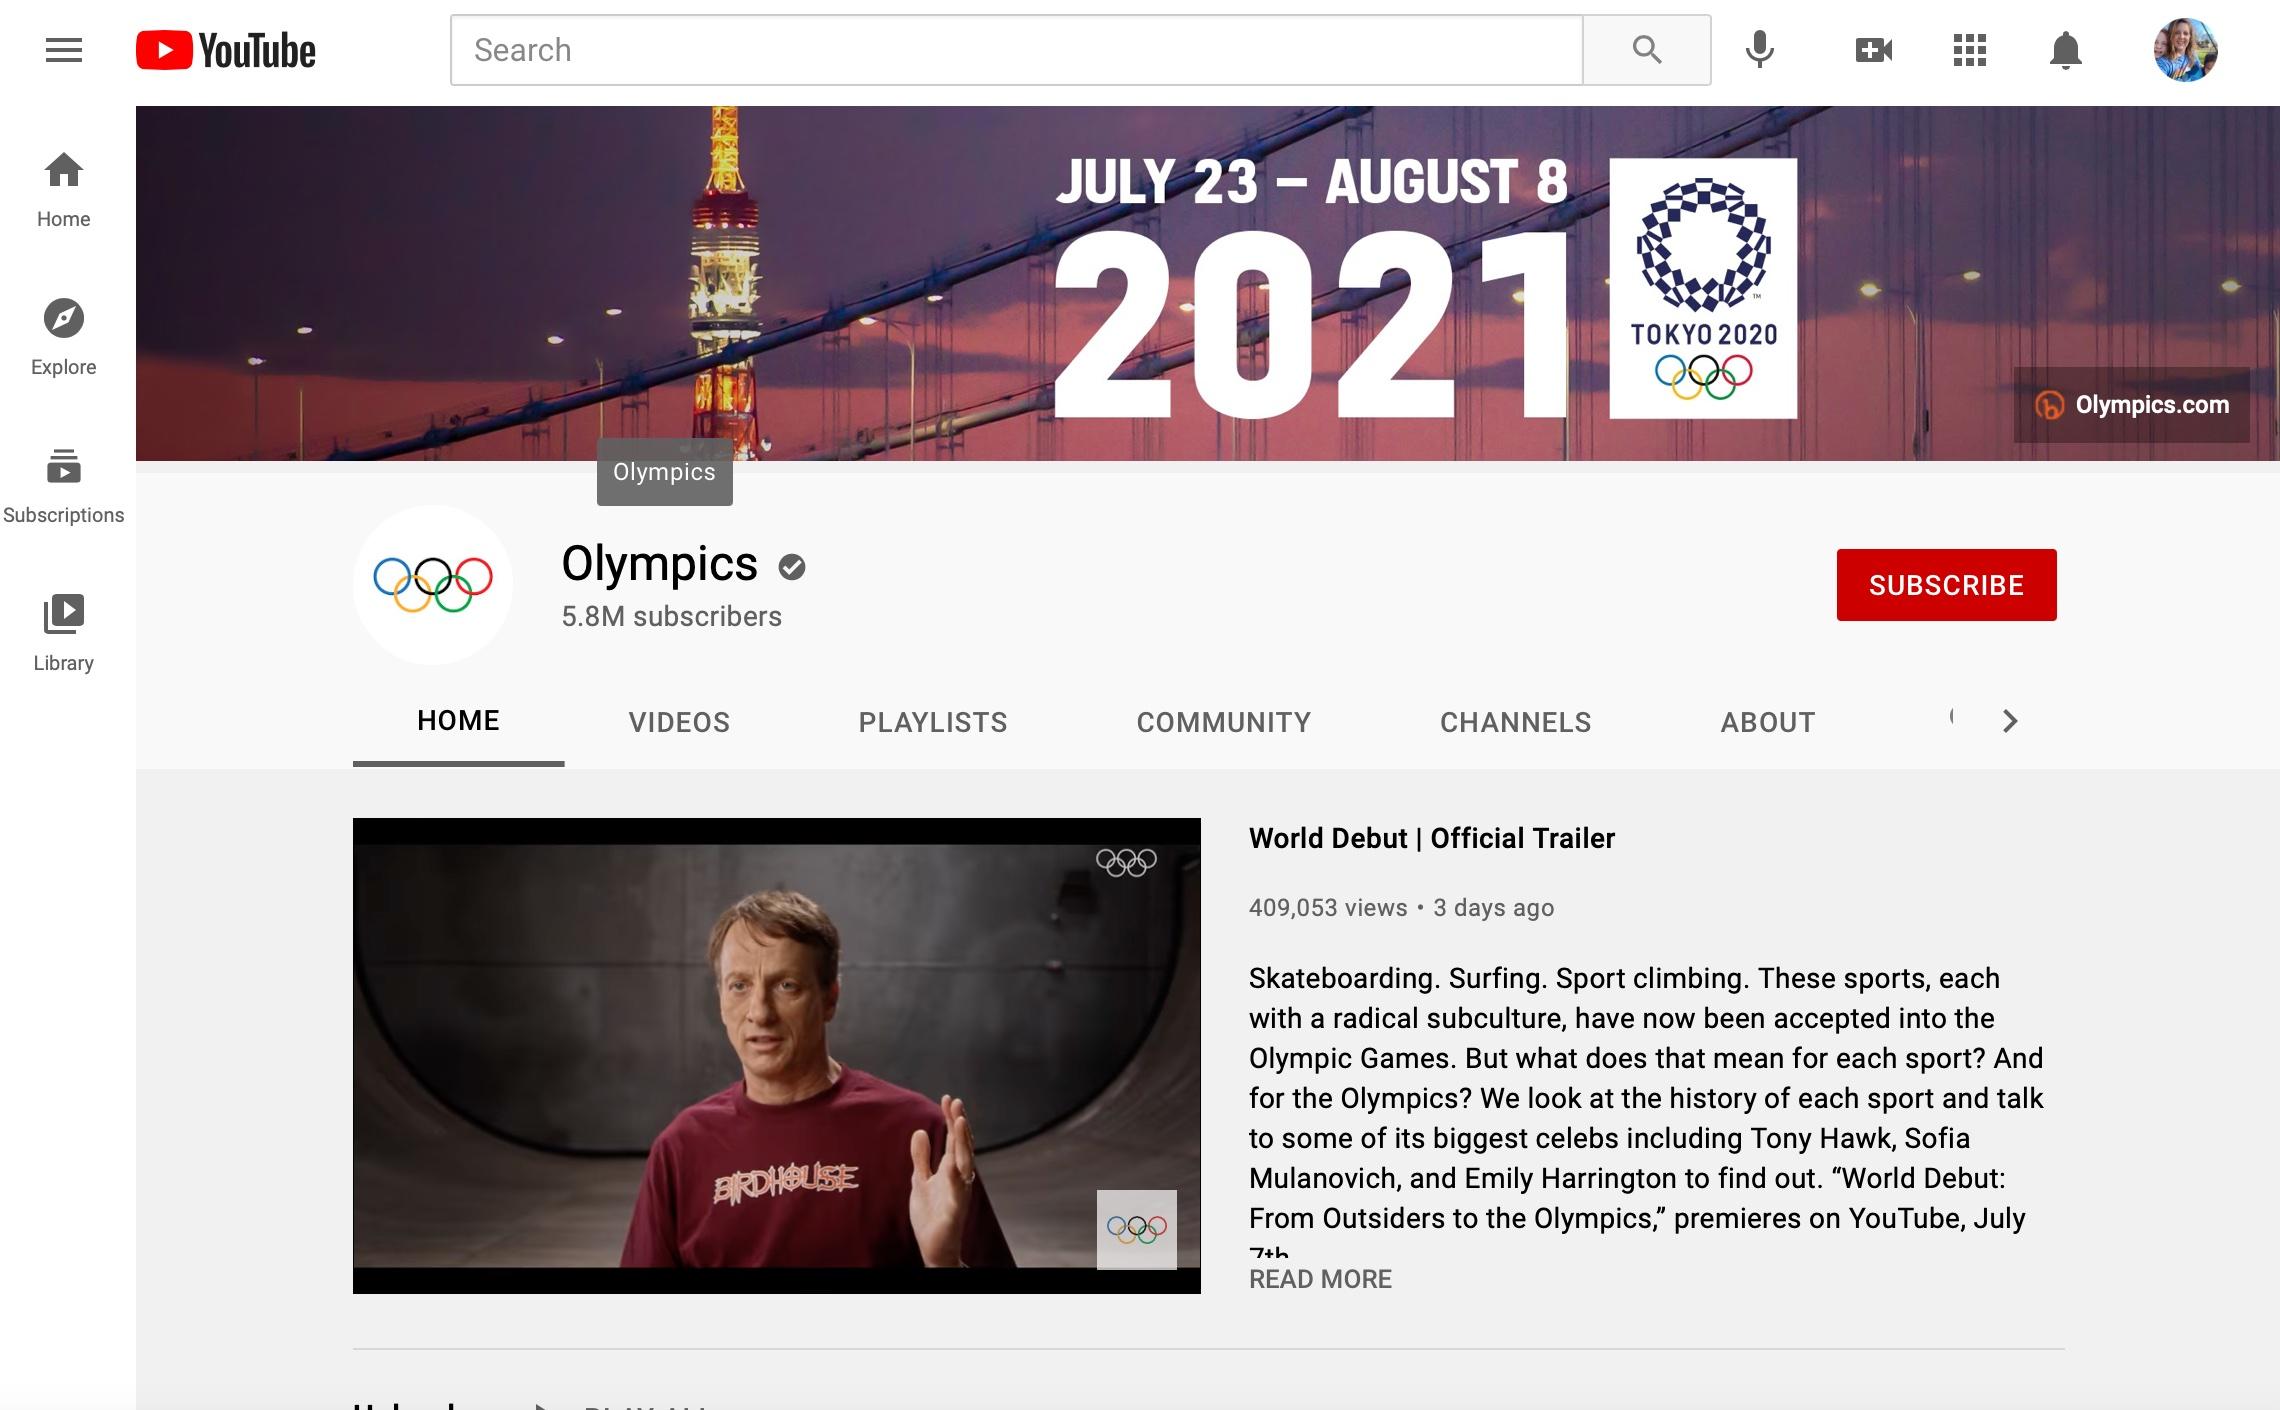 Stream the 2020 Tokyo Olympics on YouTube